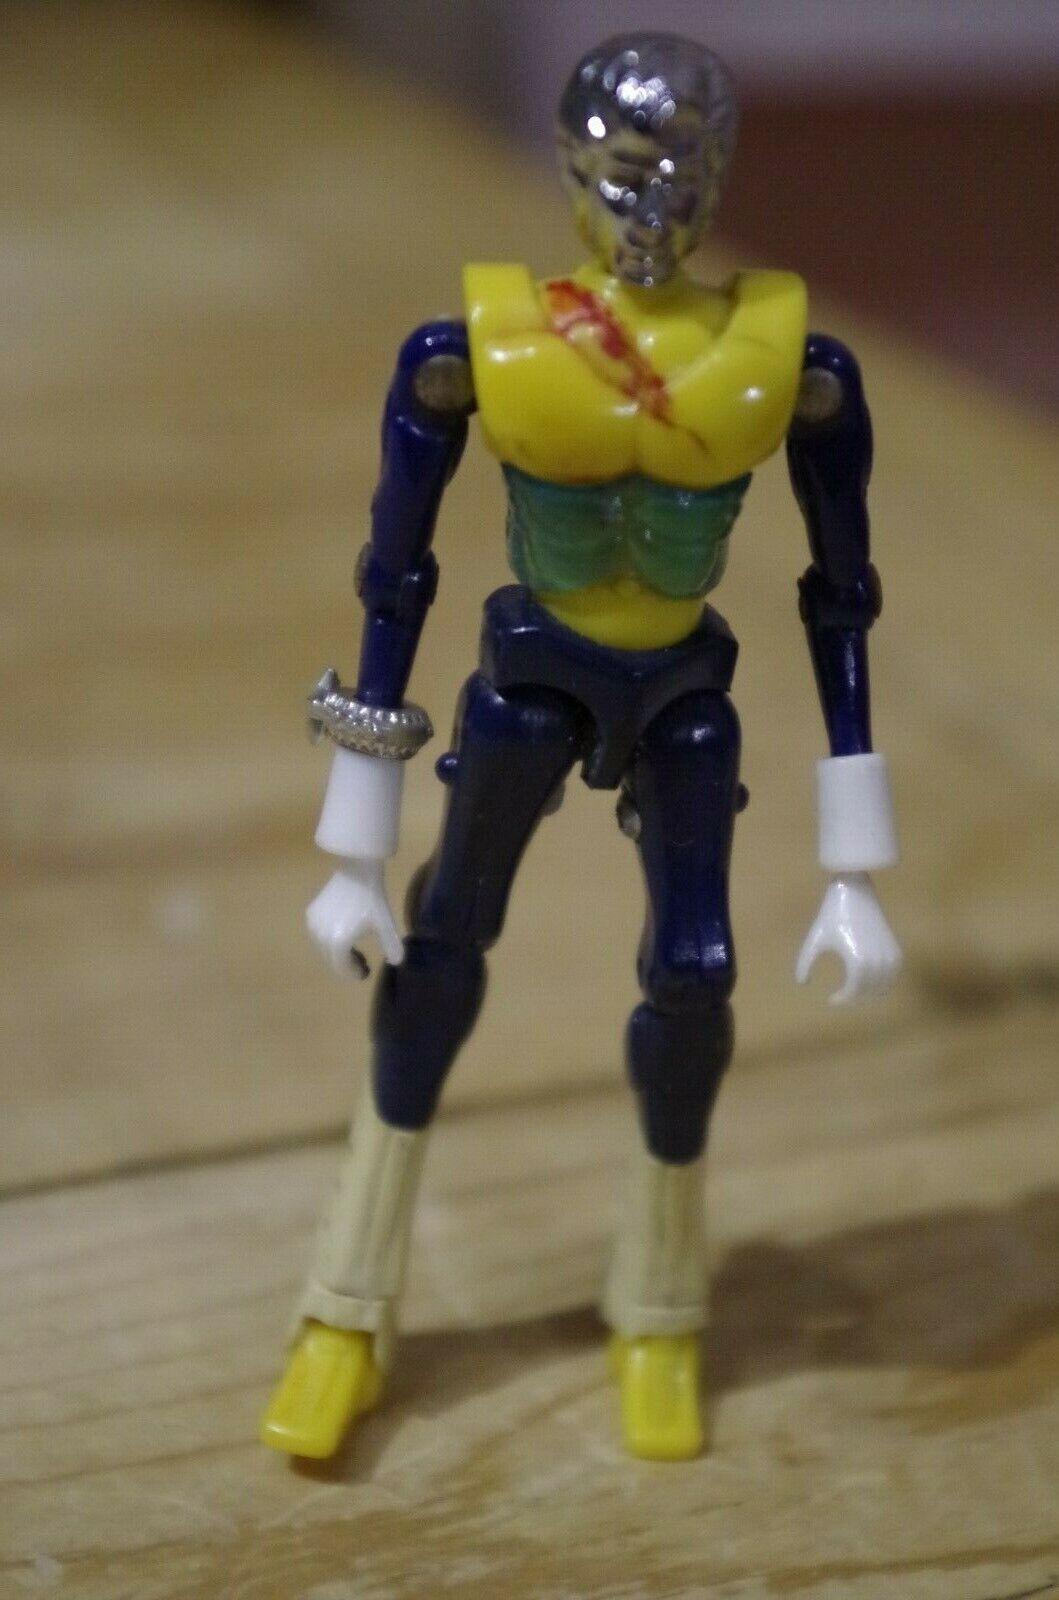 TAKARA SUPER TAKARA Microuomo M143 Holms Micronauts MEGO Henshin Cyborg vintage